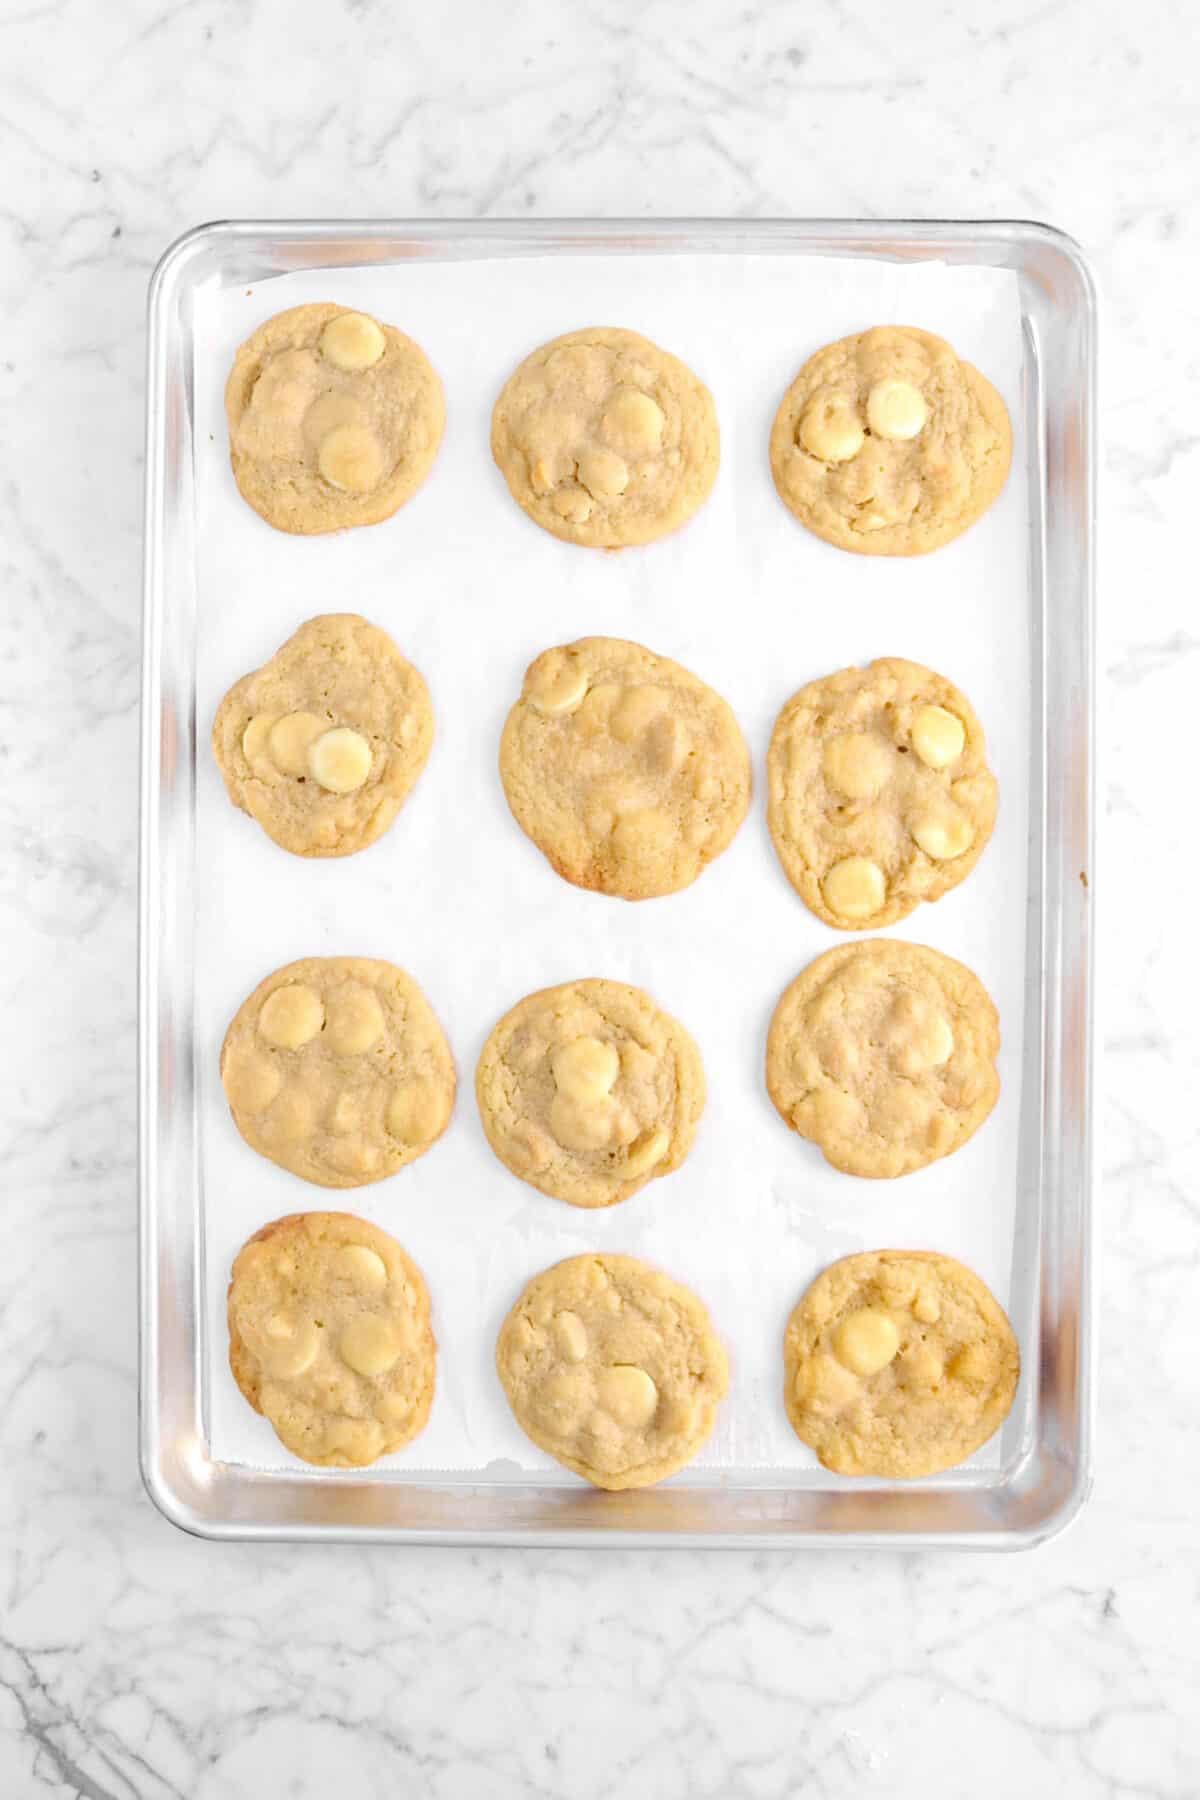 twelve baked white chocolate macadamia nut cookies